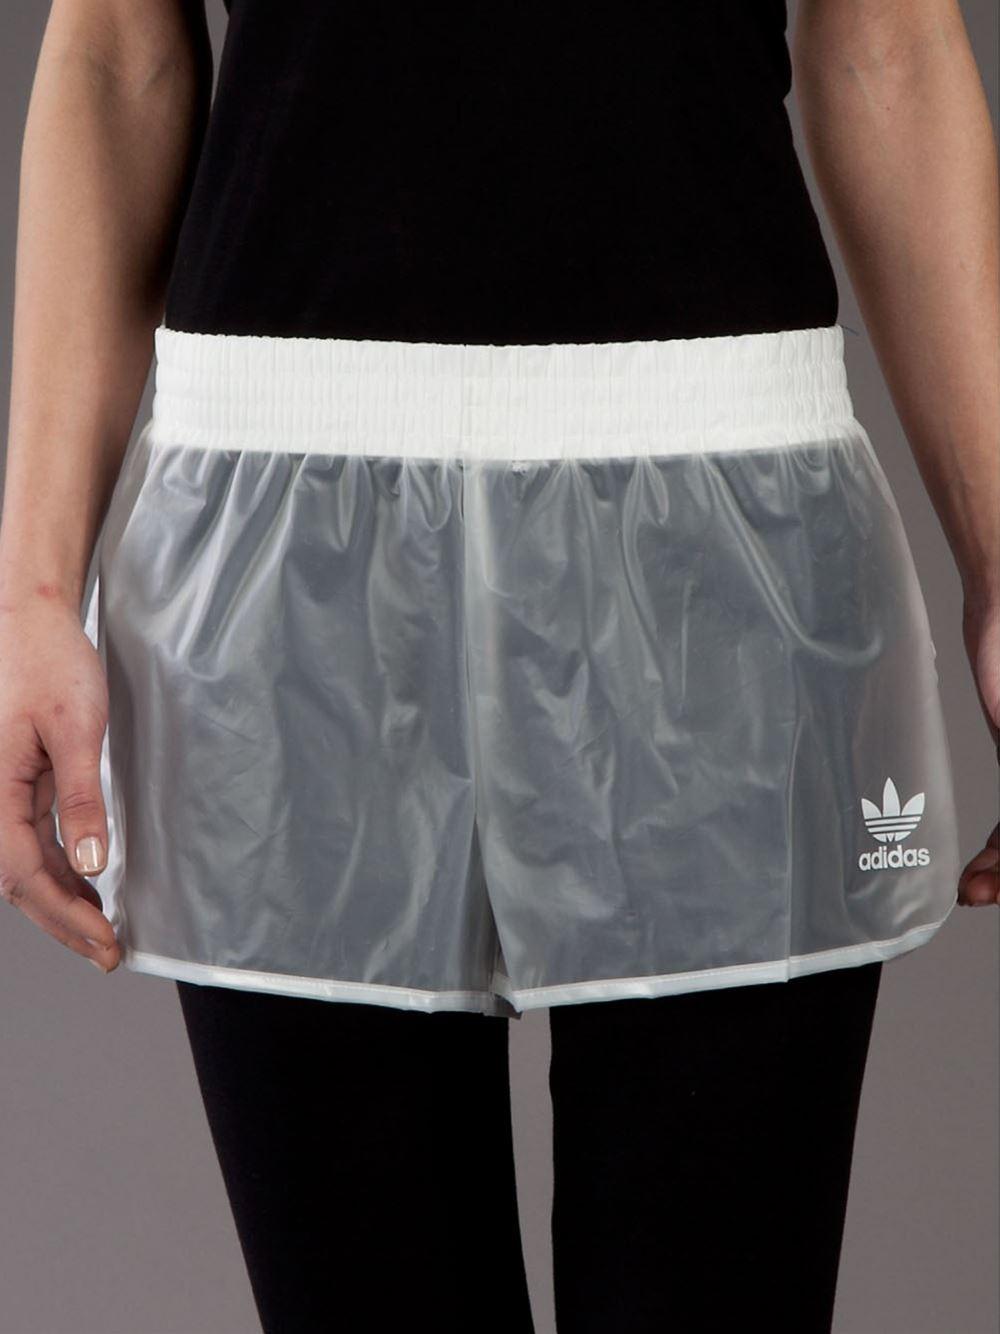 Adidas originals transparent running short